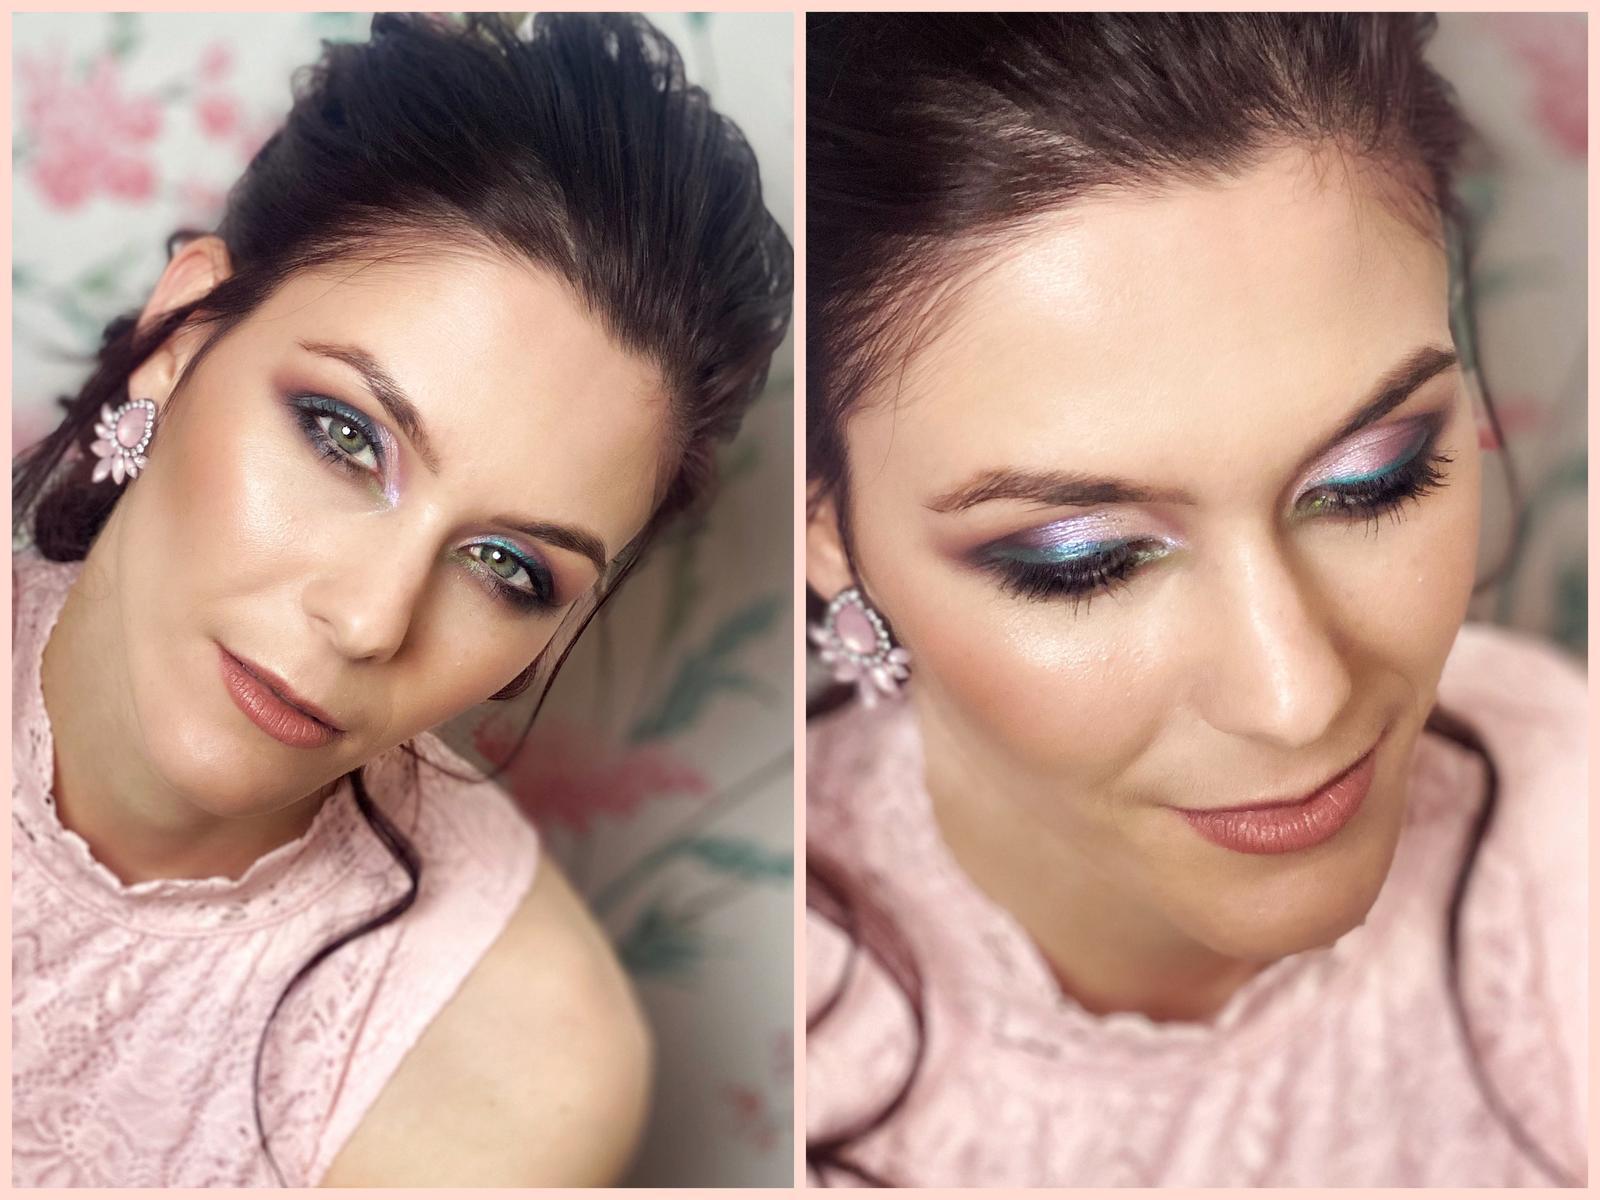 Makeup & hair 2020 - Krásná Kačka - růžovo hnědé stínované oko de zelenou linkou,tělová rtenka a výrazný konturing🌸,na ples ideal🌸